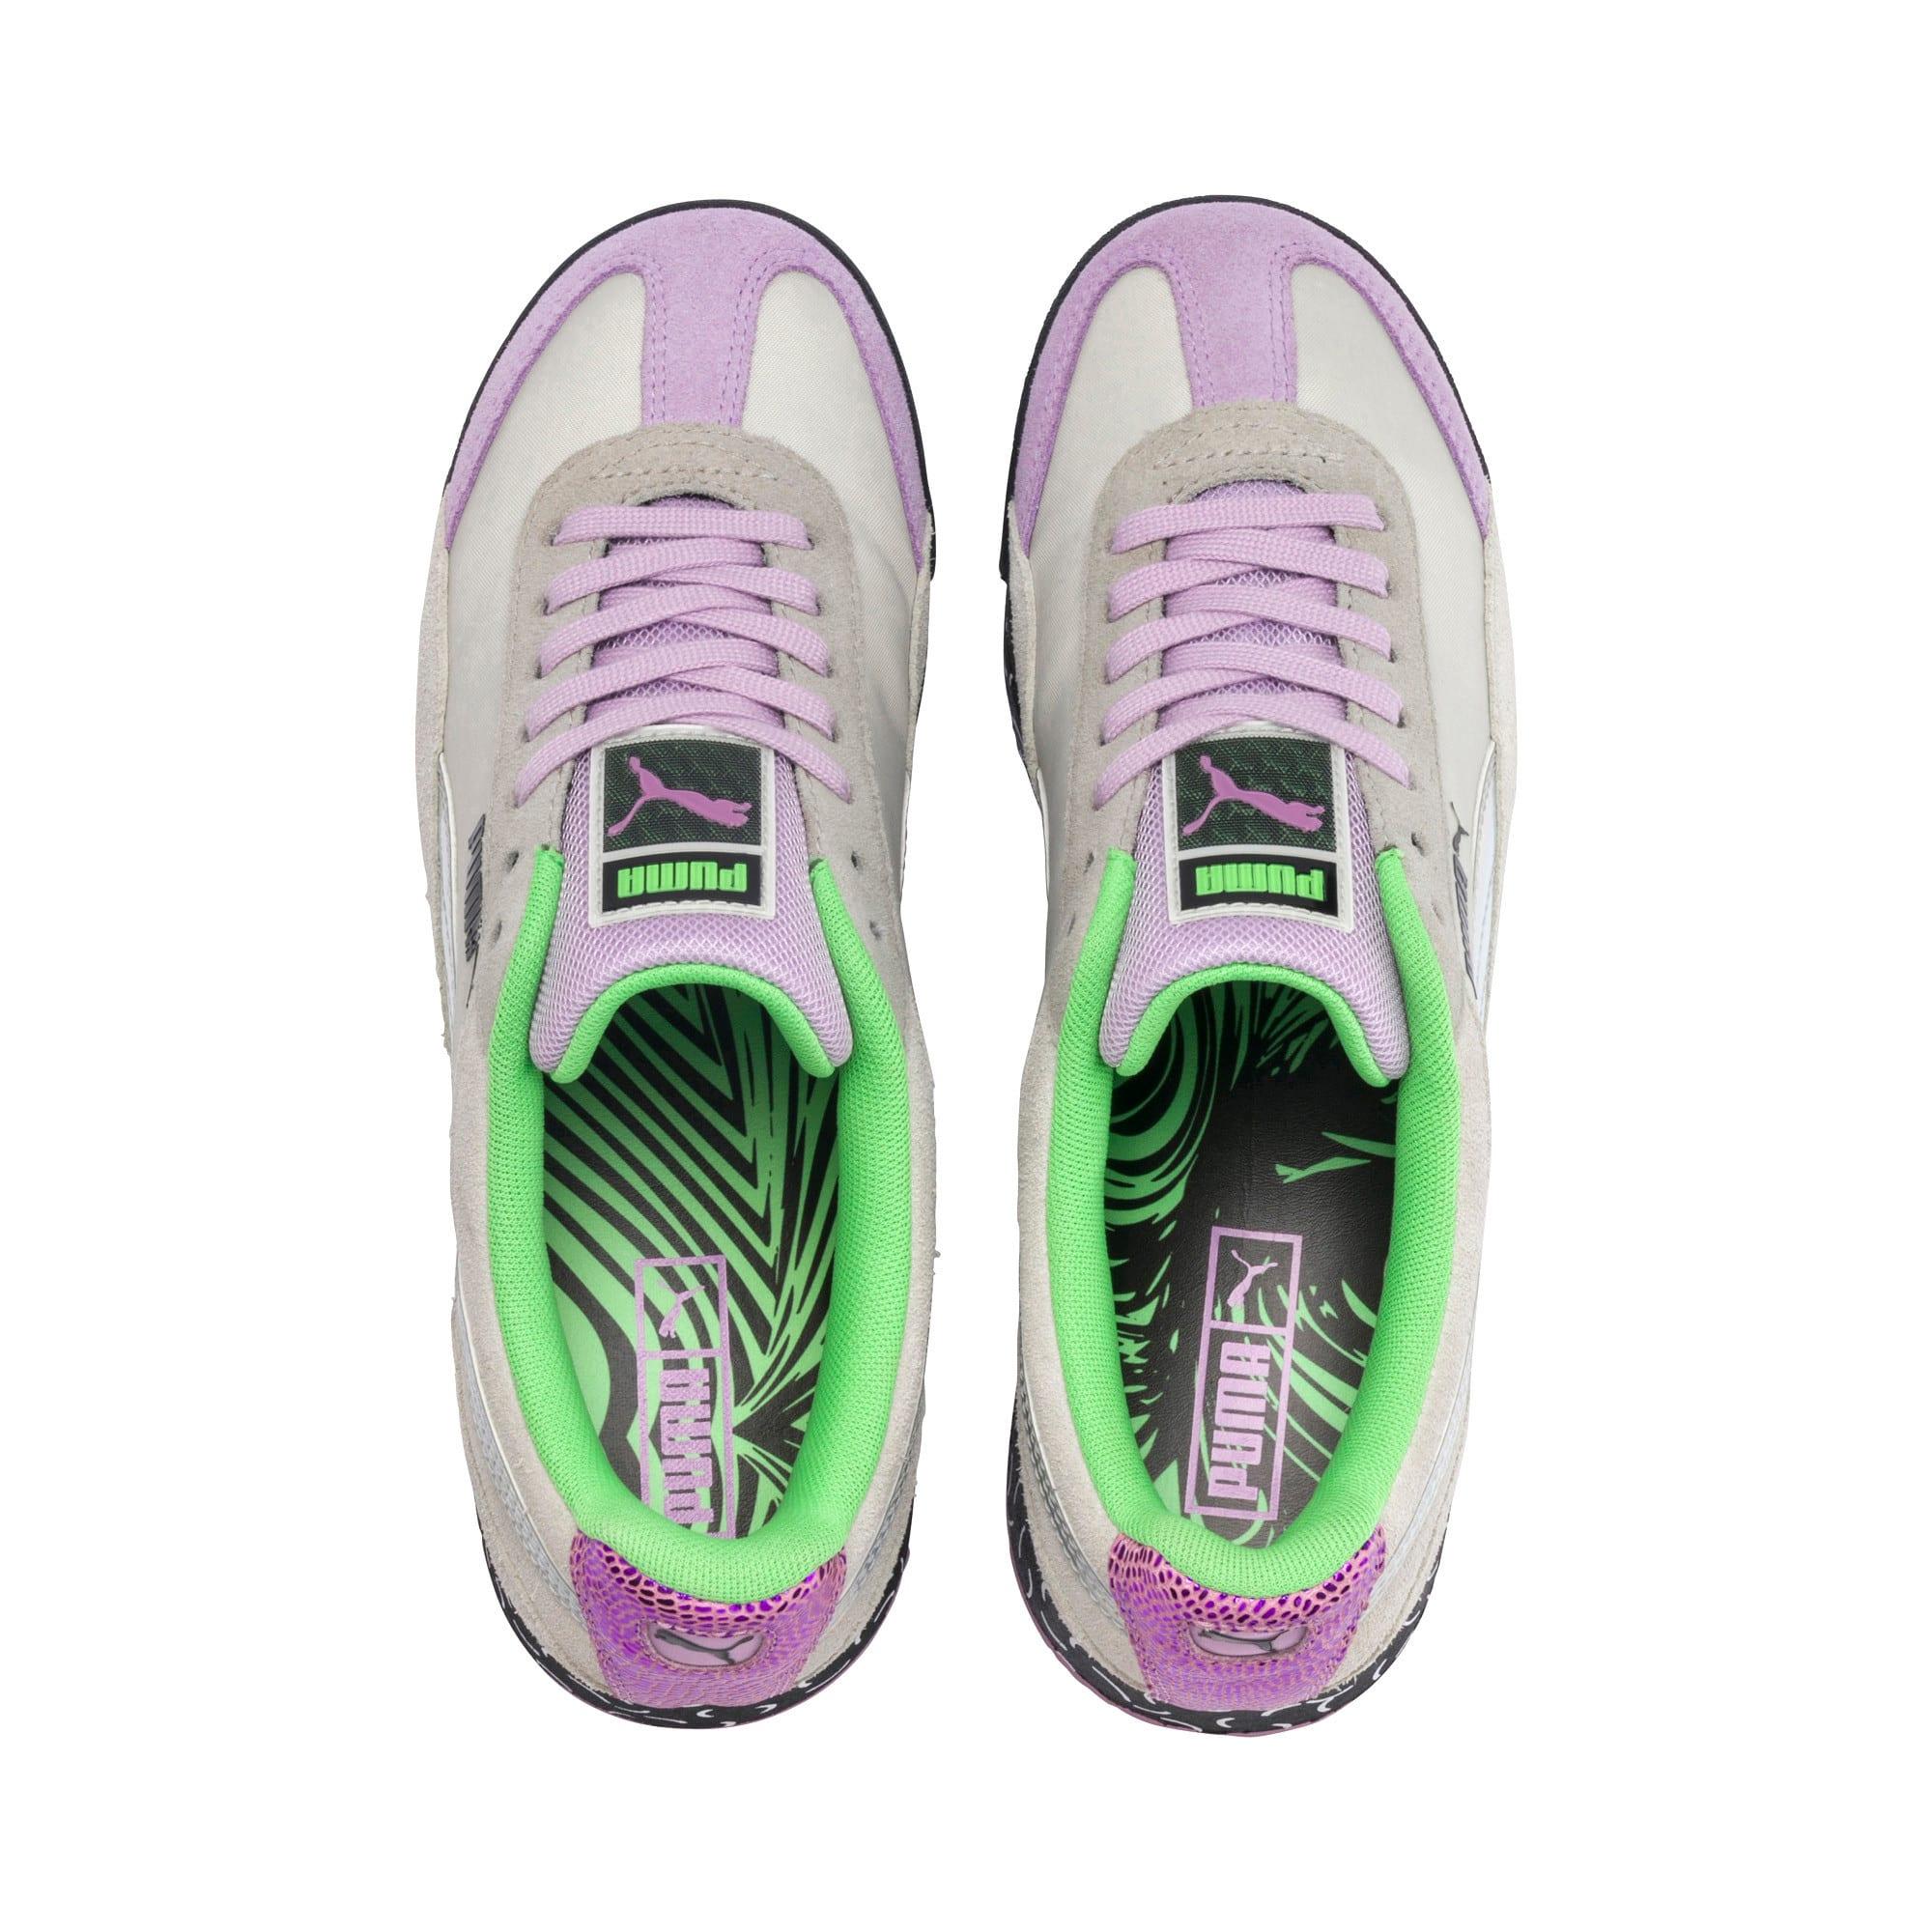 Thumbnail 6 of Roma Amor Dimension Women's Sneakers, Agate Gray-Smoky Grape, medium